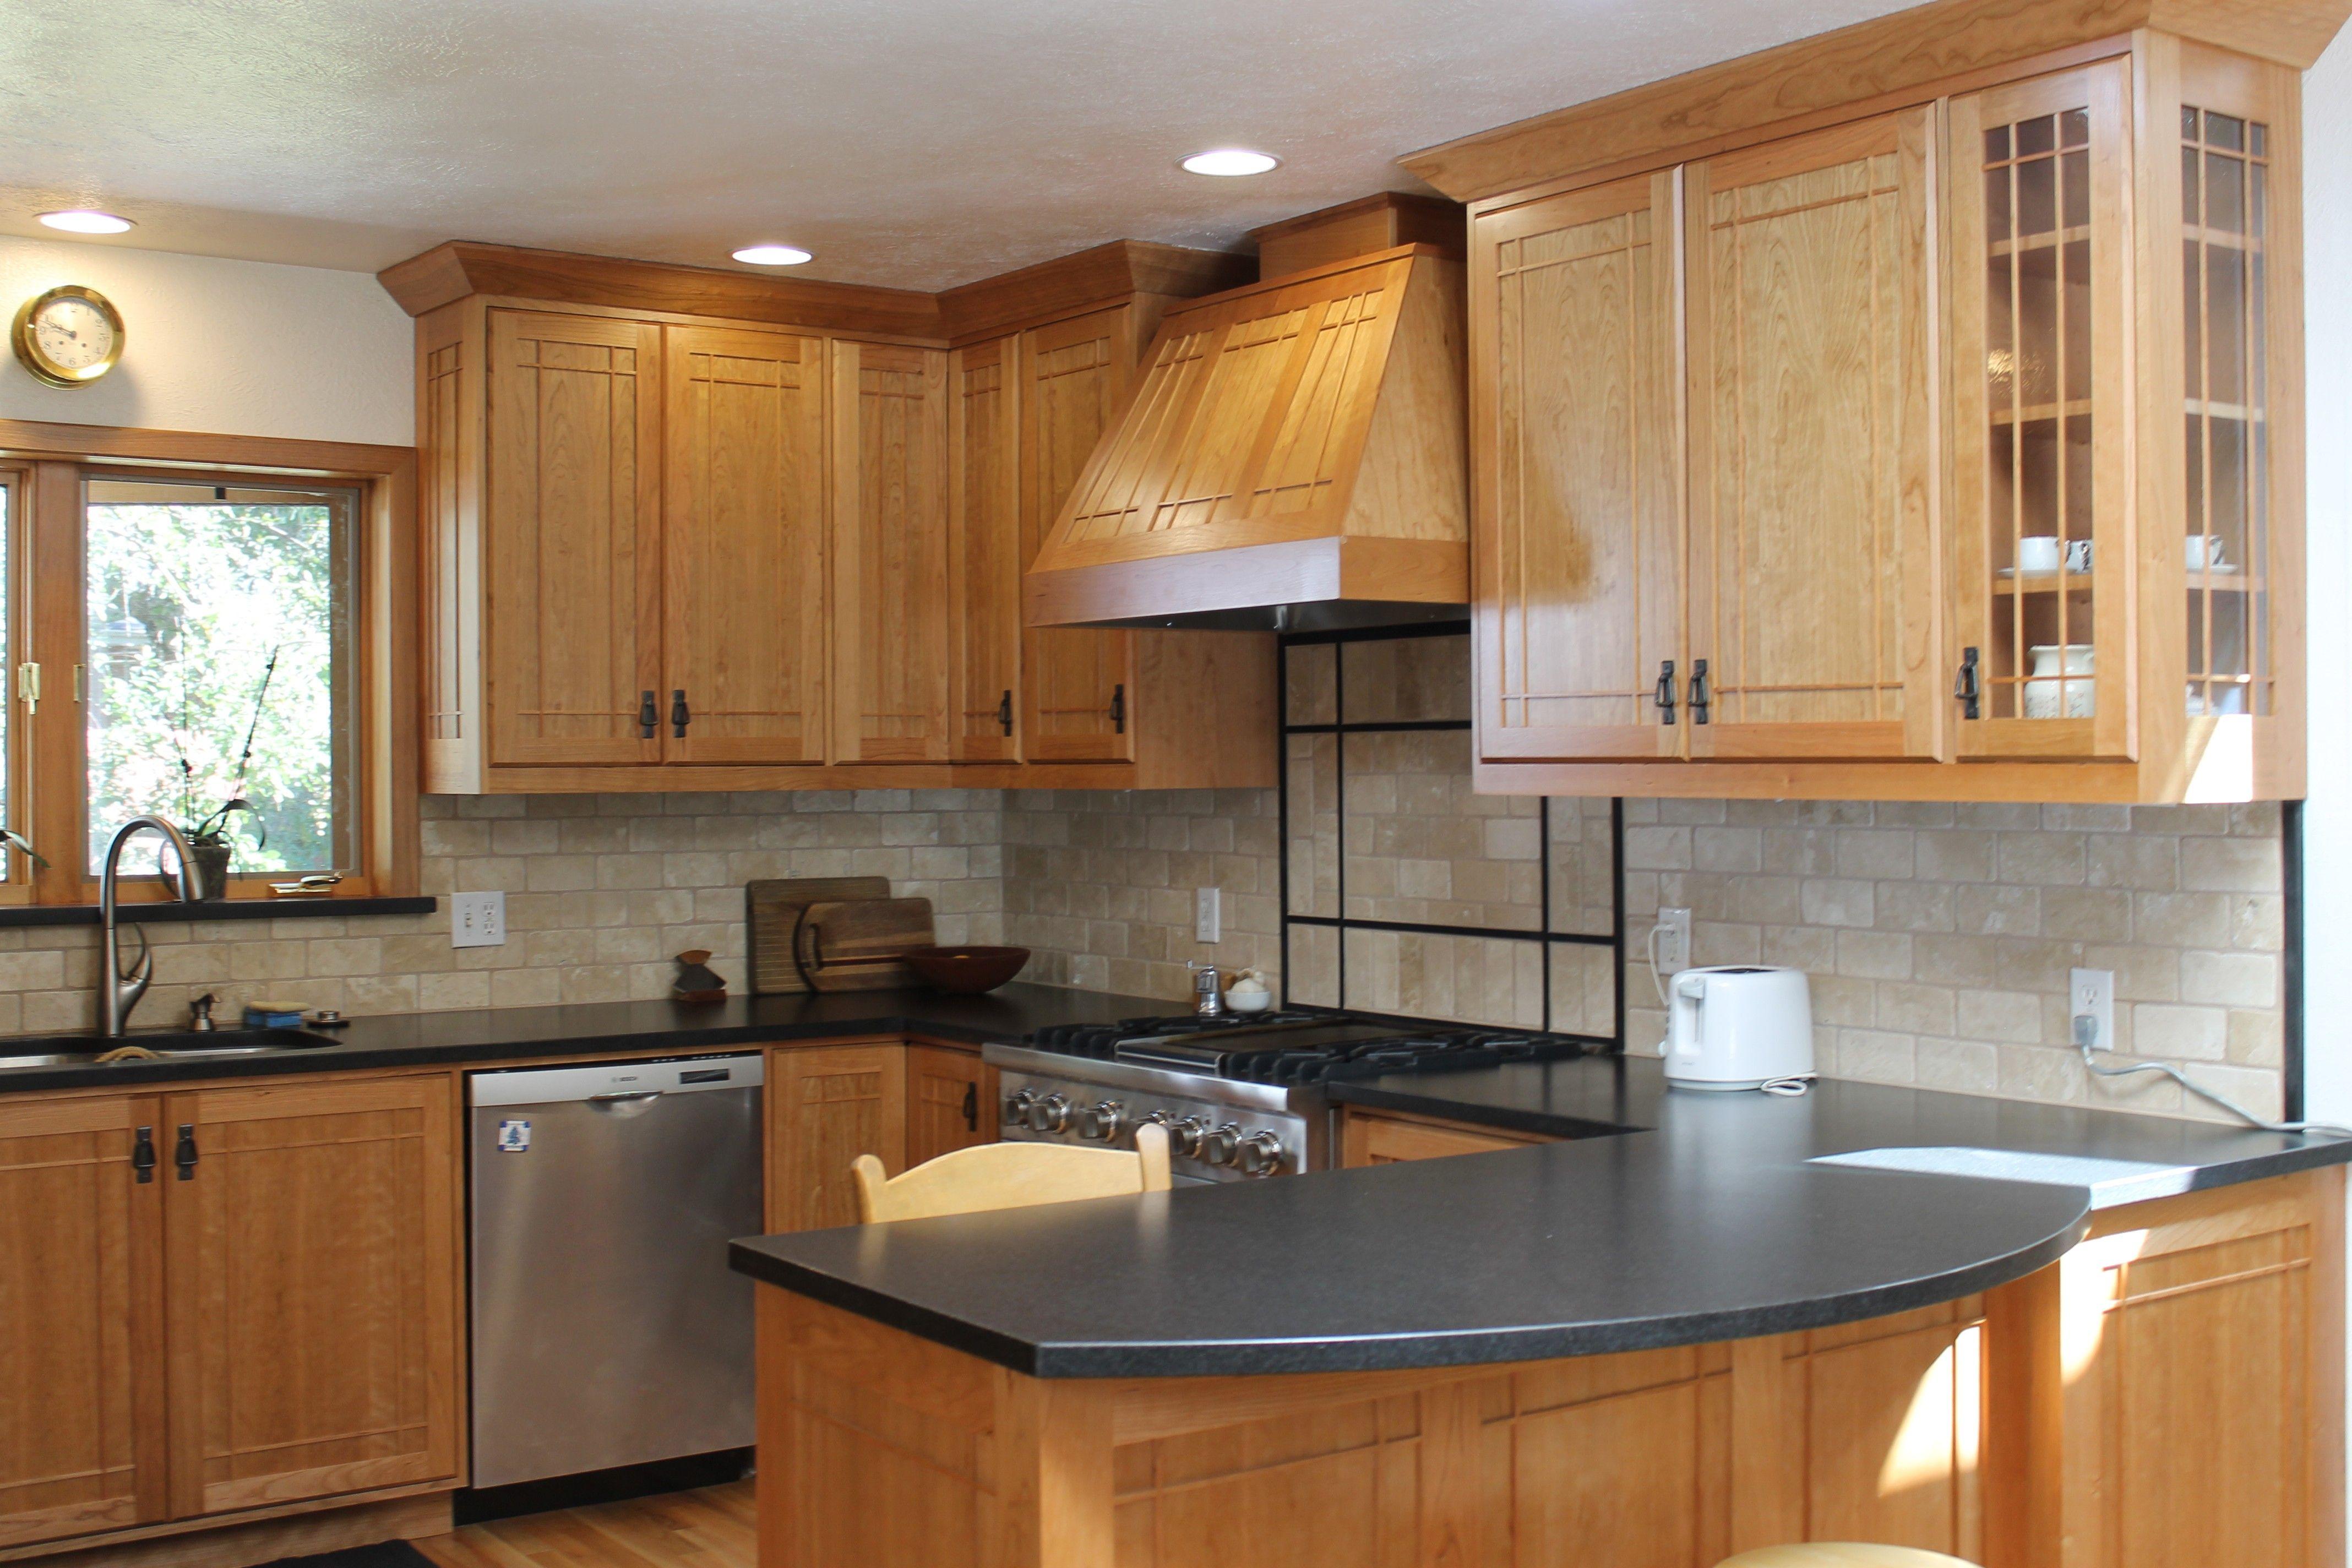 light oak kitchen cabinets utensil holder ideas granite countertop colors for maple